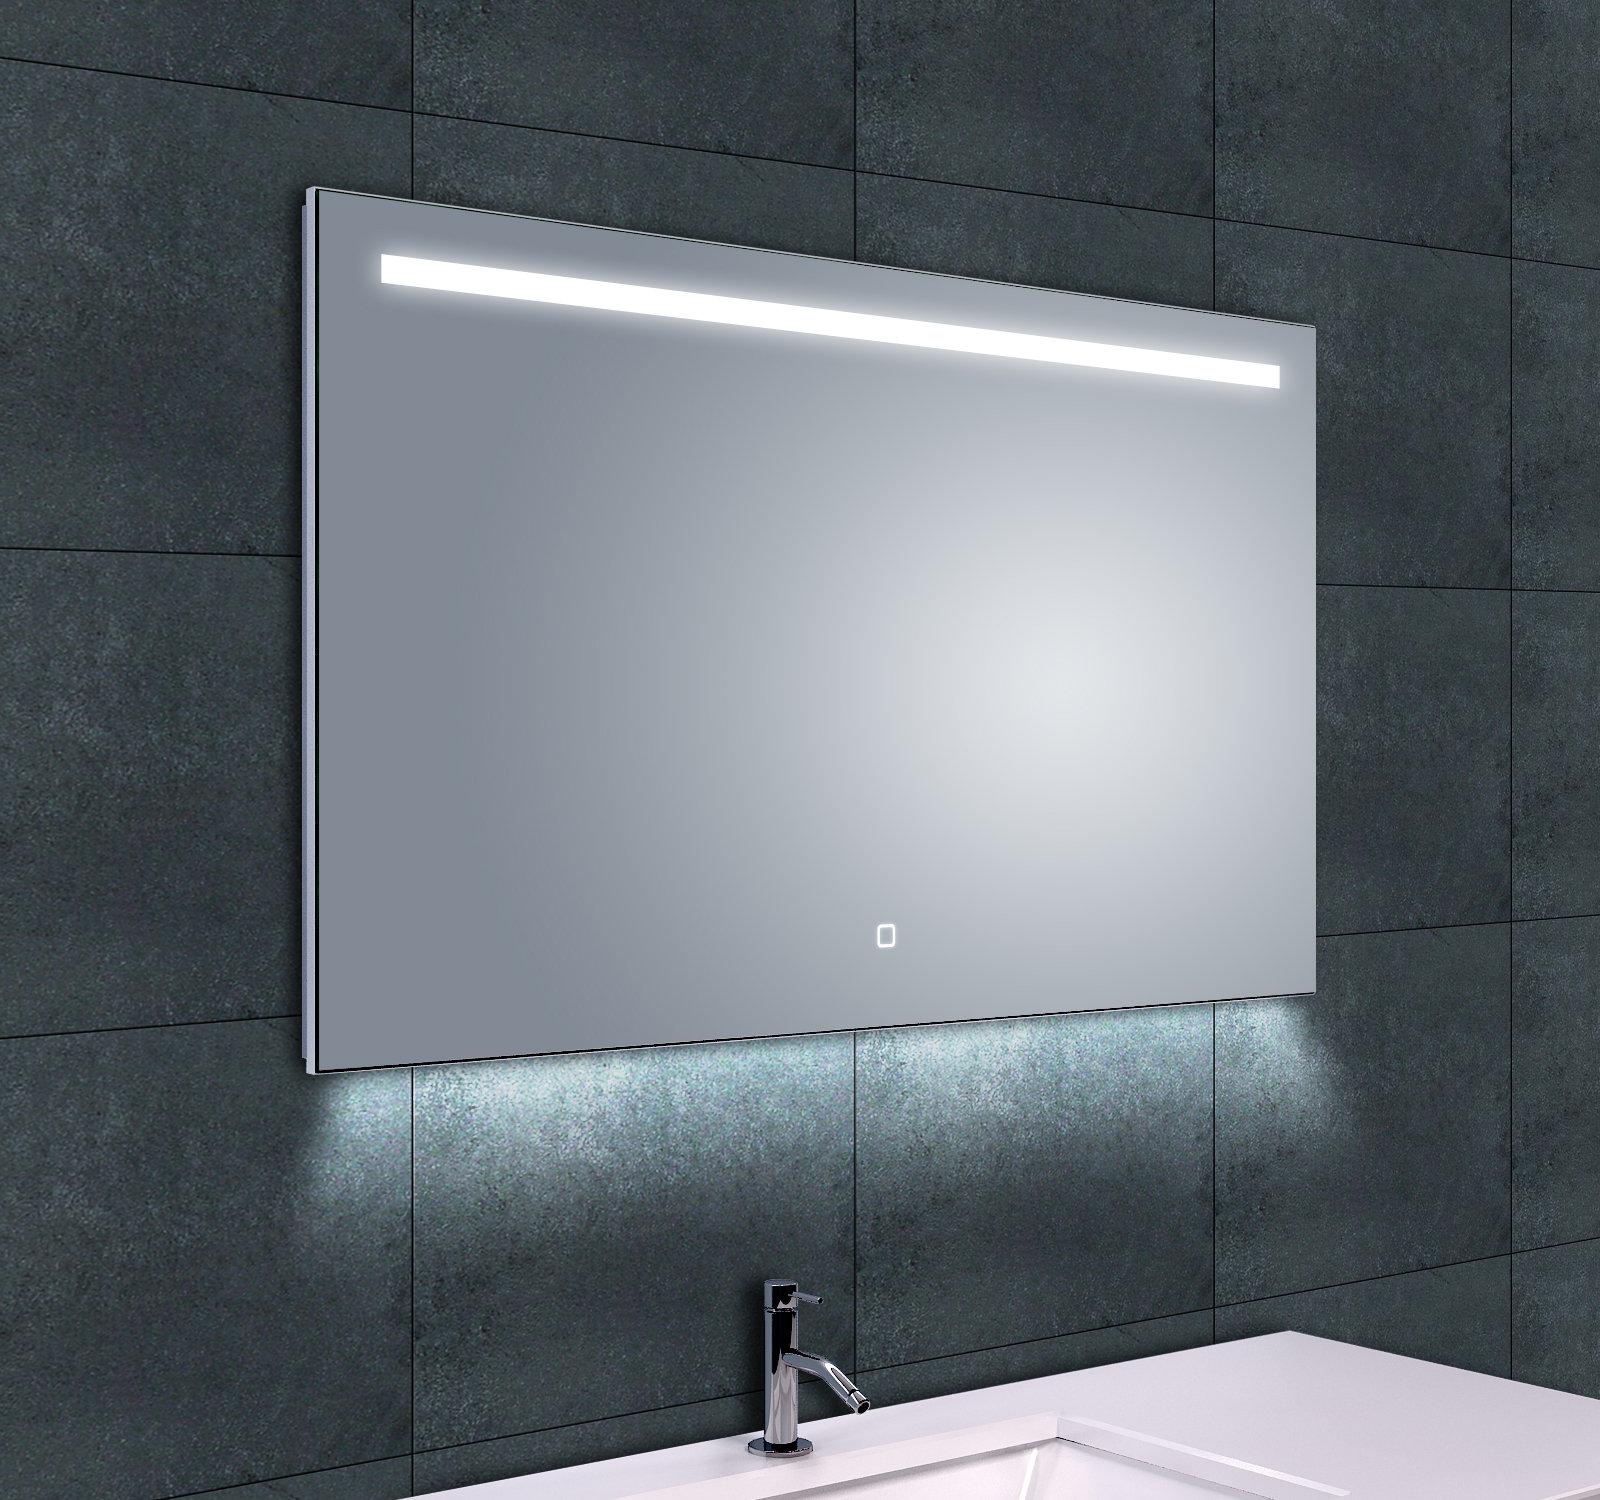 https://www.badkamer.nl/badkamers/images/merk-arcon-spiegel-kasten/arcon-dimbare-badkamerspiegel-100-x-60-cm.jpg